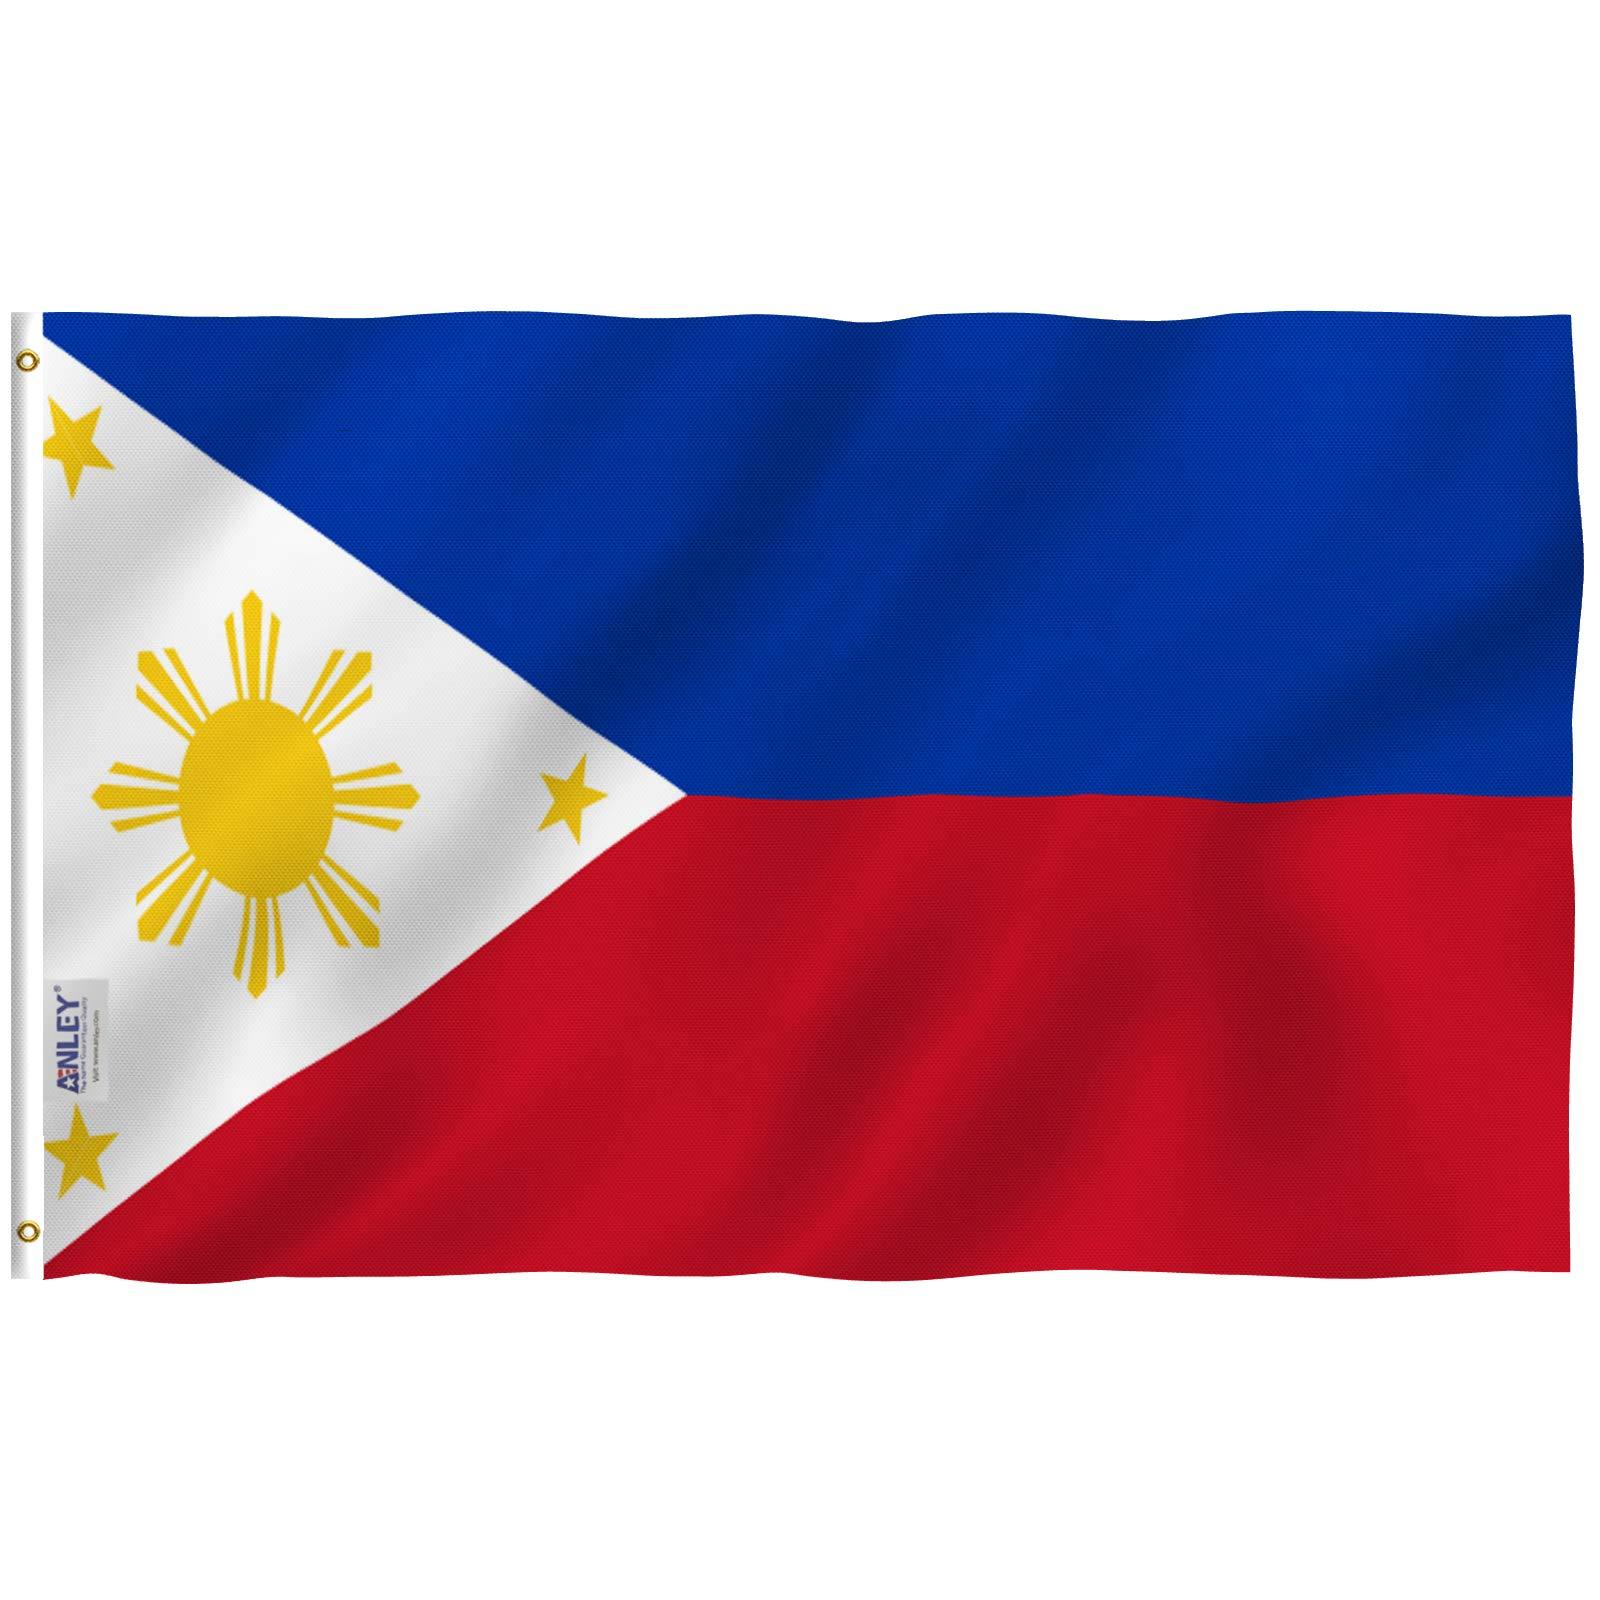 SHOPZEUS Philippines Flag 3 x 5 New 3x5 Foot Filipino Banner